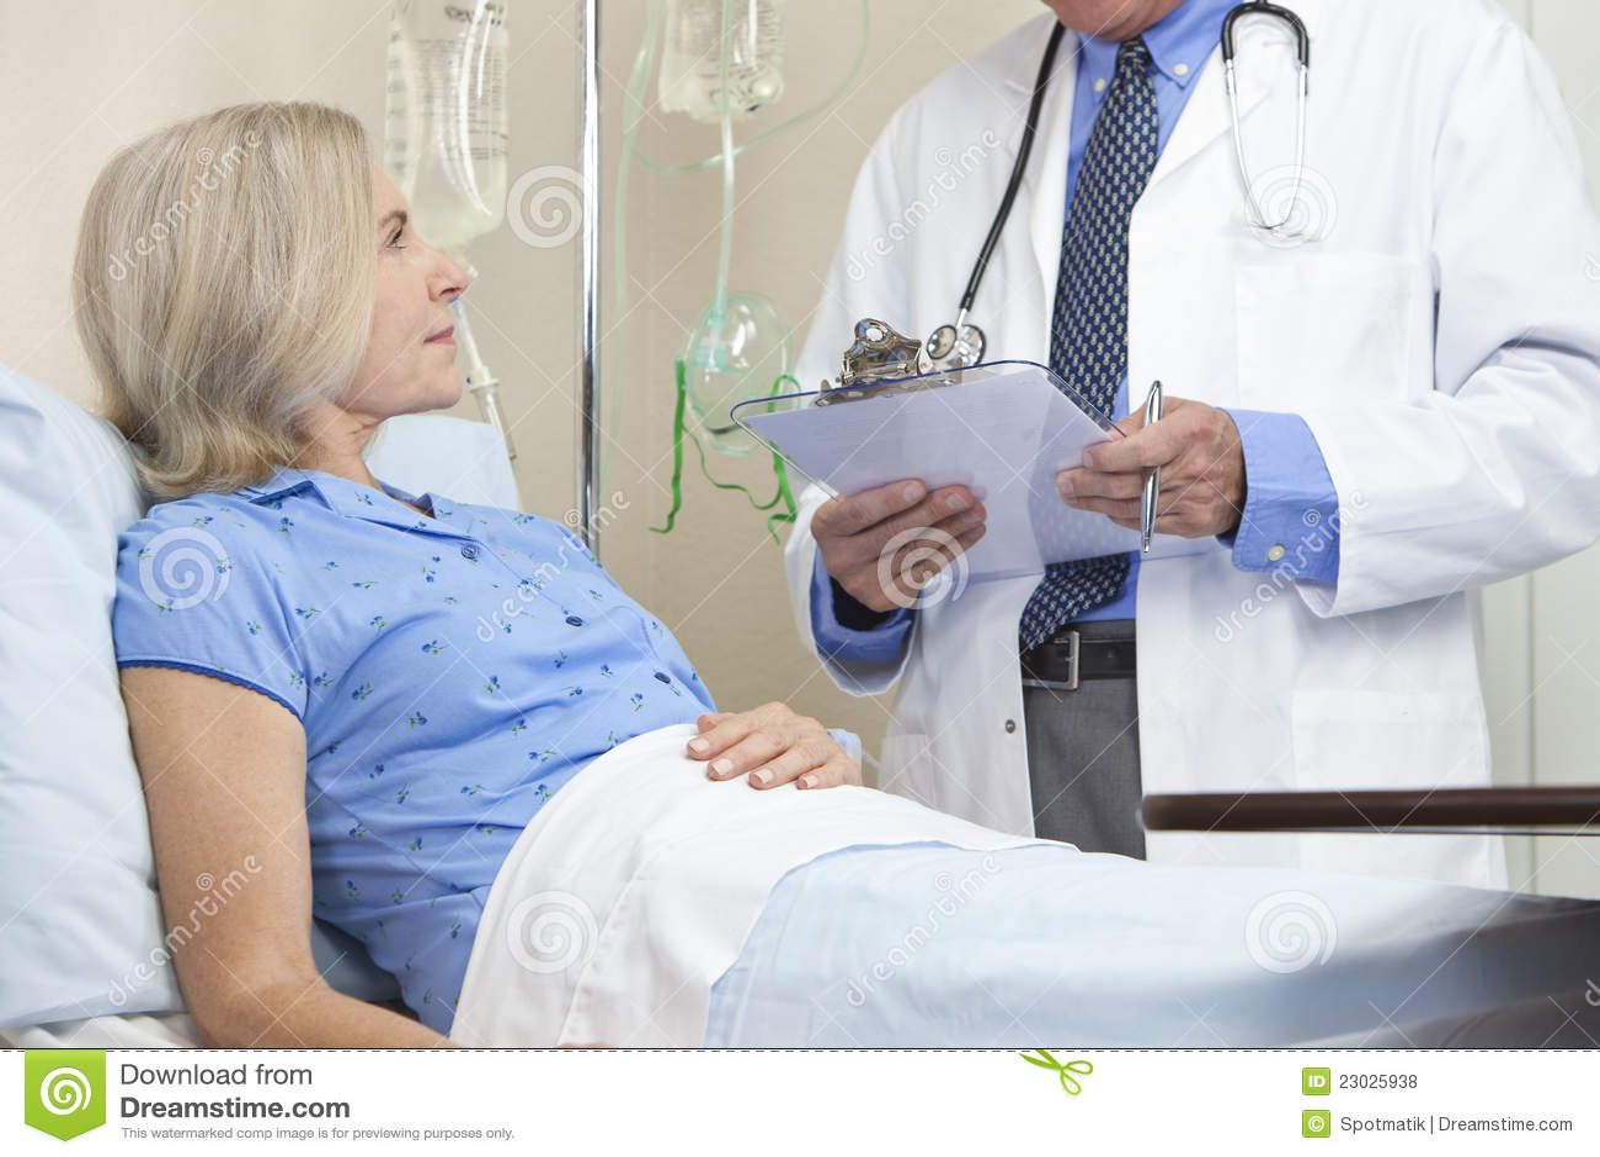 Doctor Porno - Doctores Calientes Teniendo Sexo con